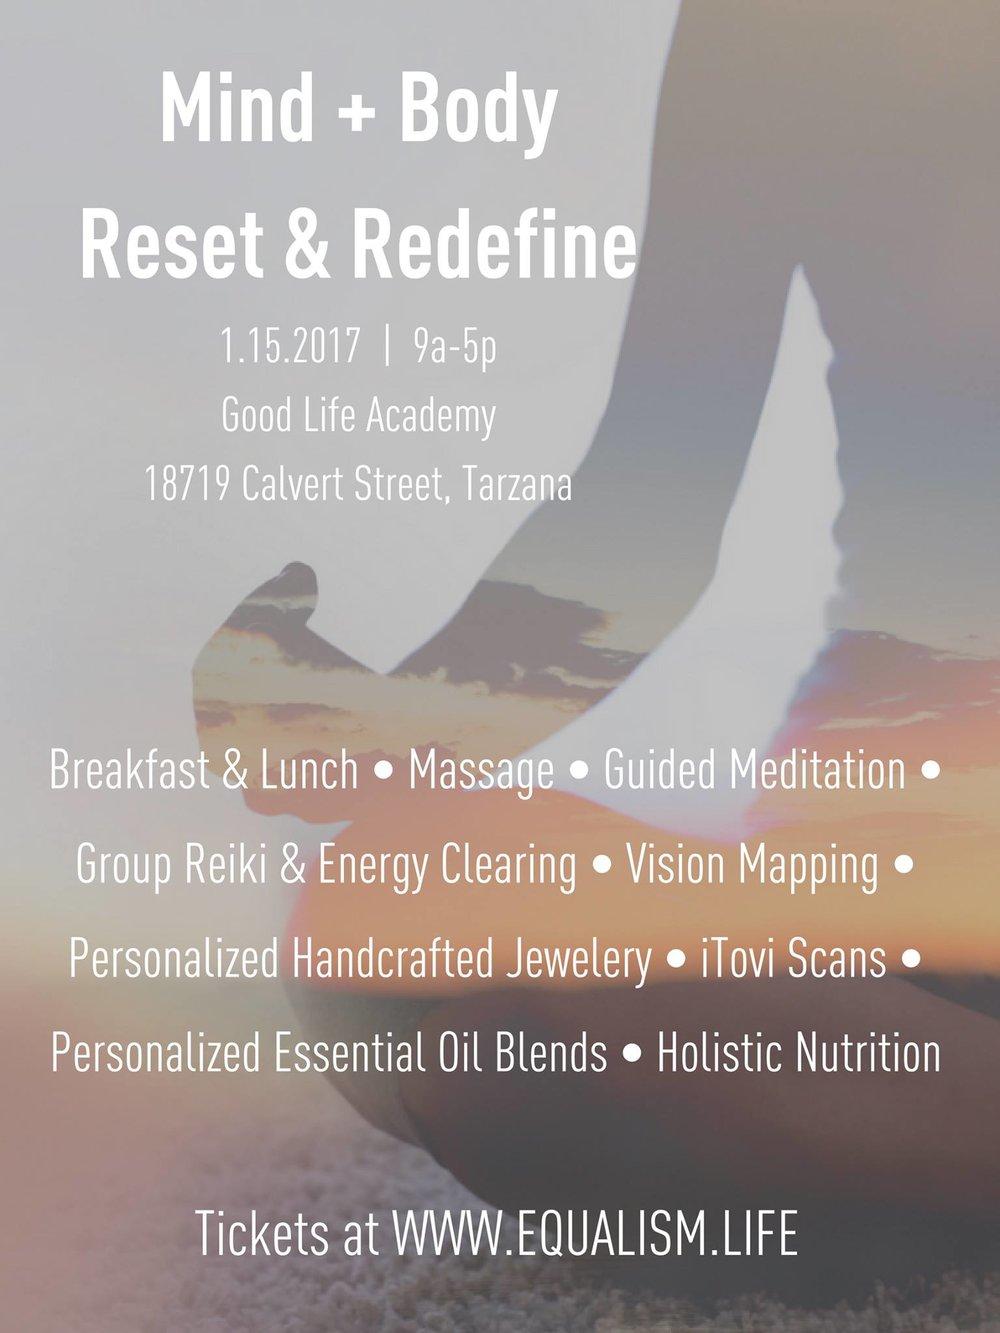 Mind Body Retreat 2017 Poster.jpg